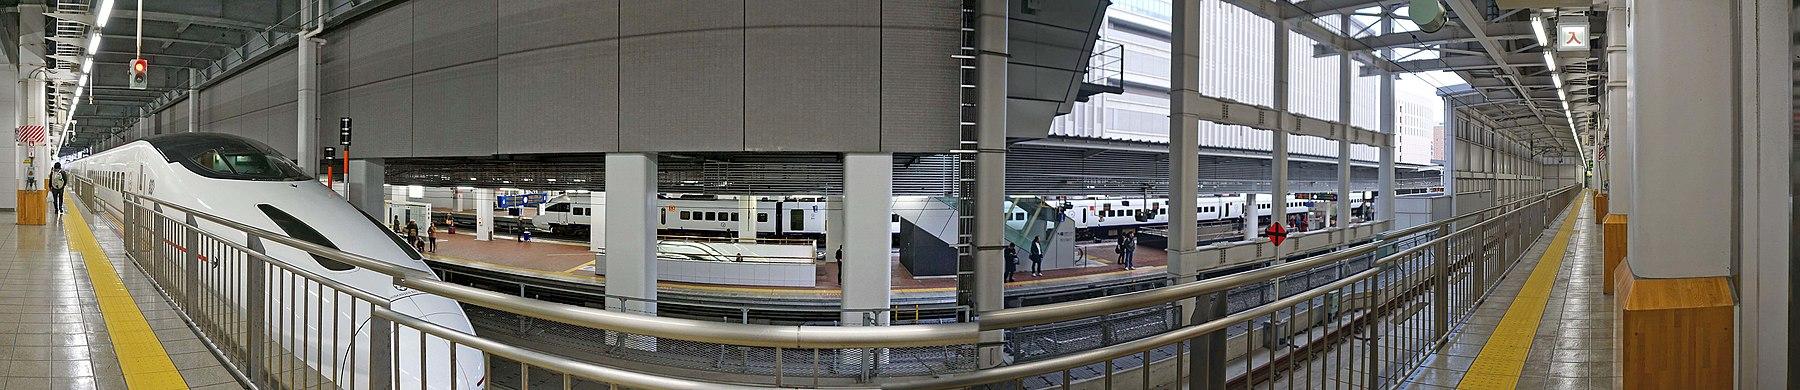 JR Hakata station , JR 博多駅 - panoramio (8).jpg